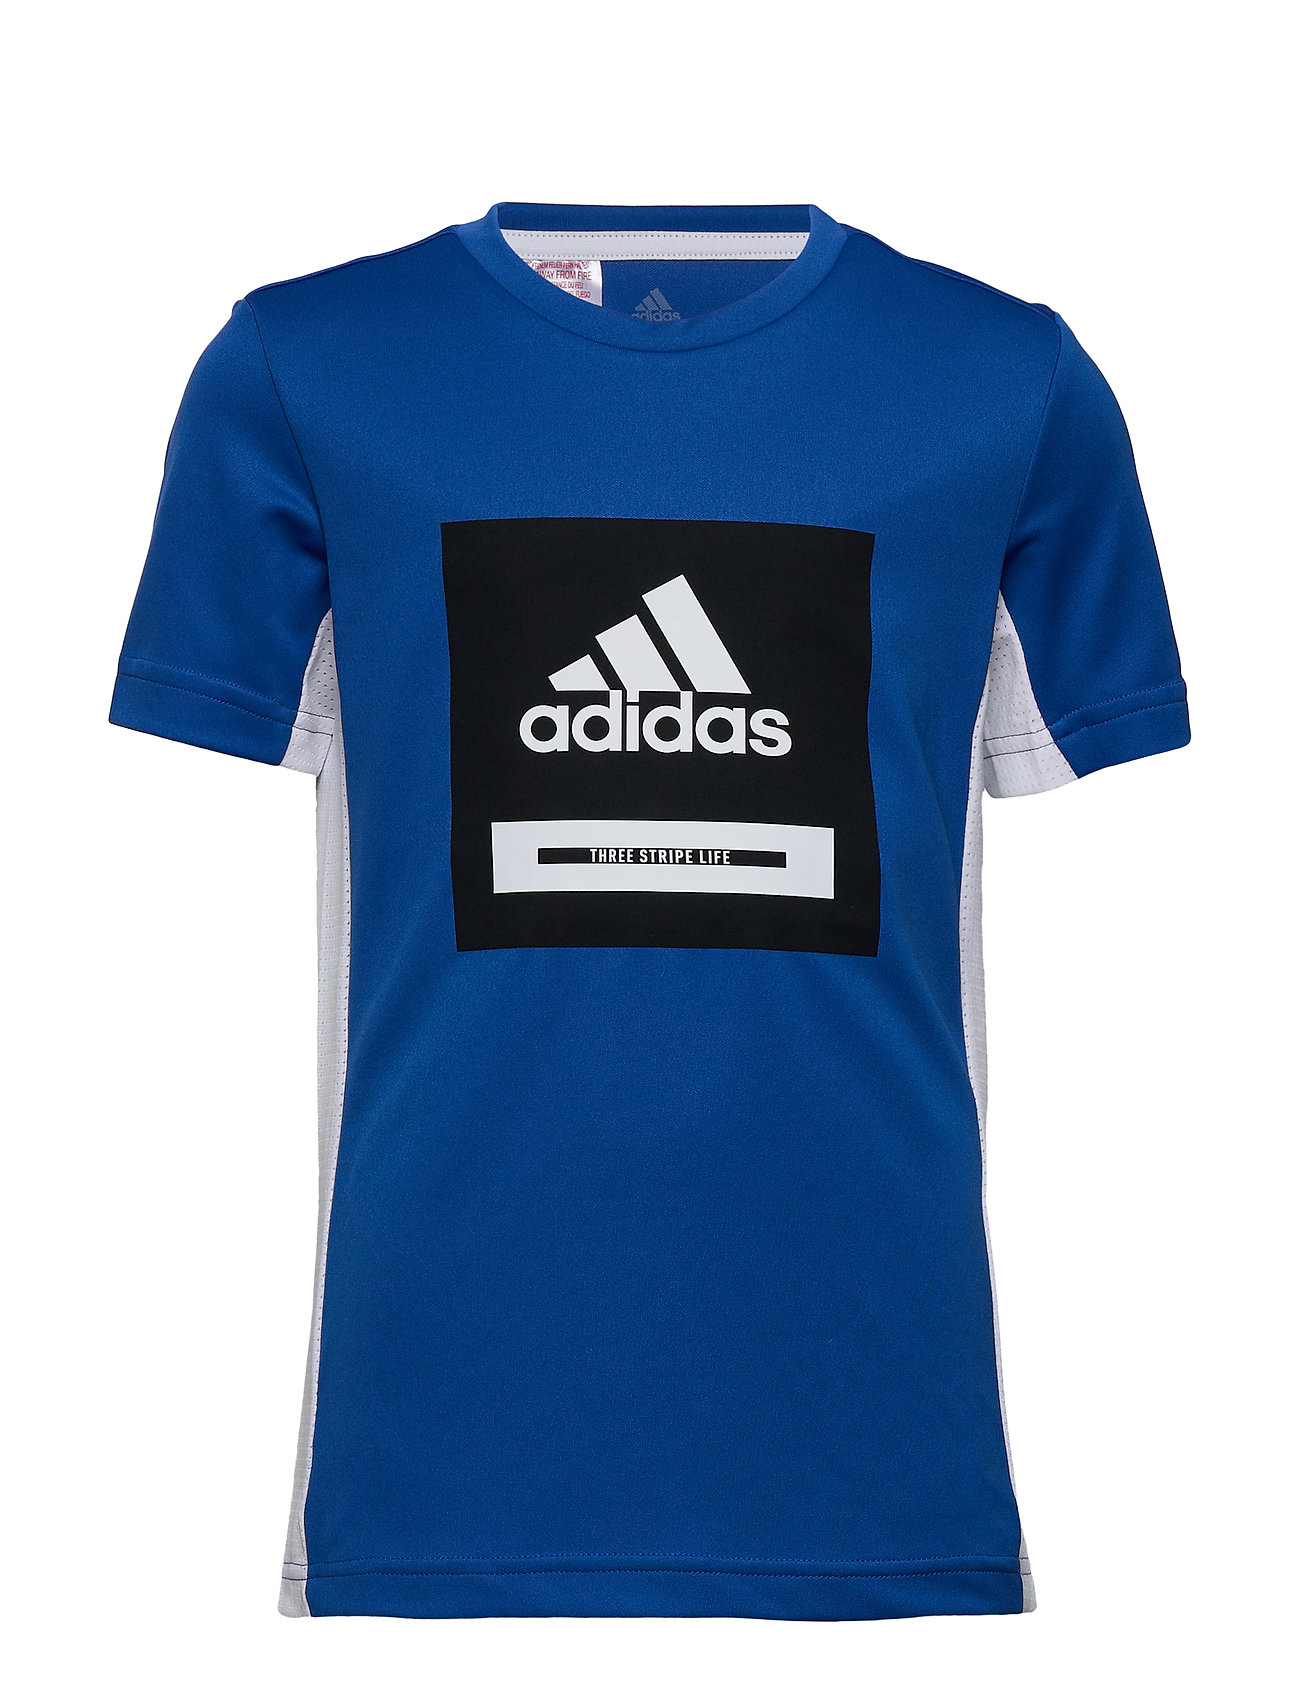 adidas Performance JB TR BOLD TEE - BLUE/WHITE